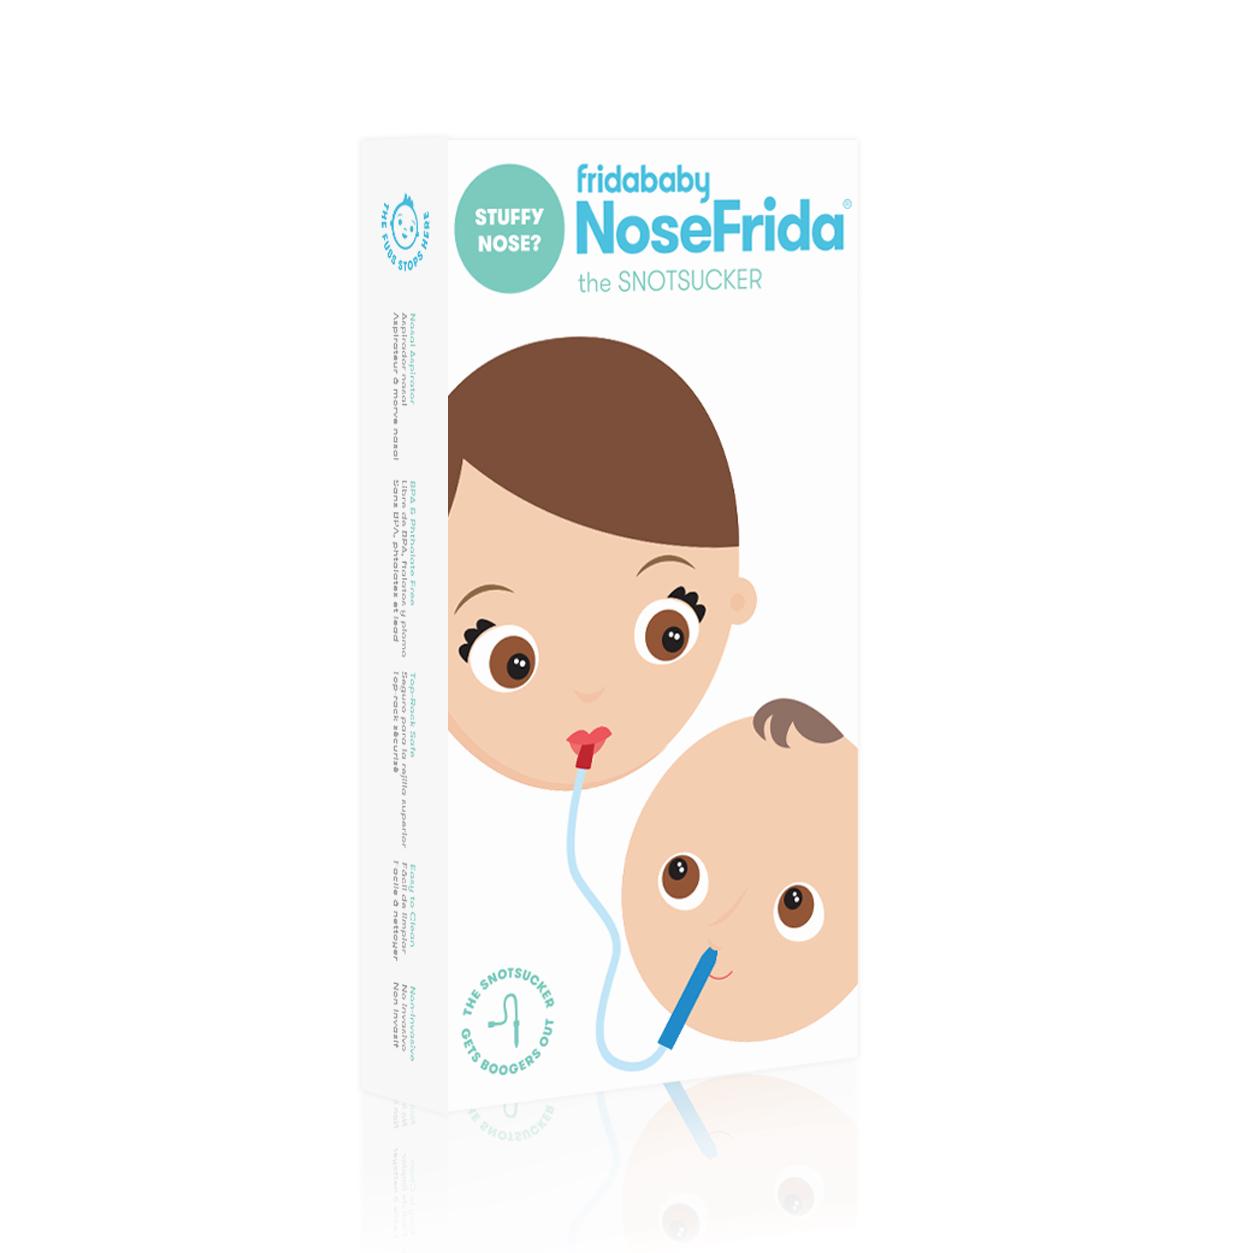 The best snotsucker in the world. NoseFrida by FridaBaby